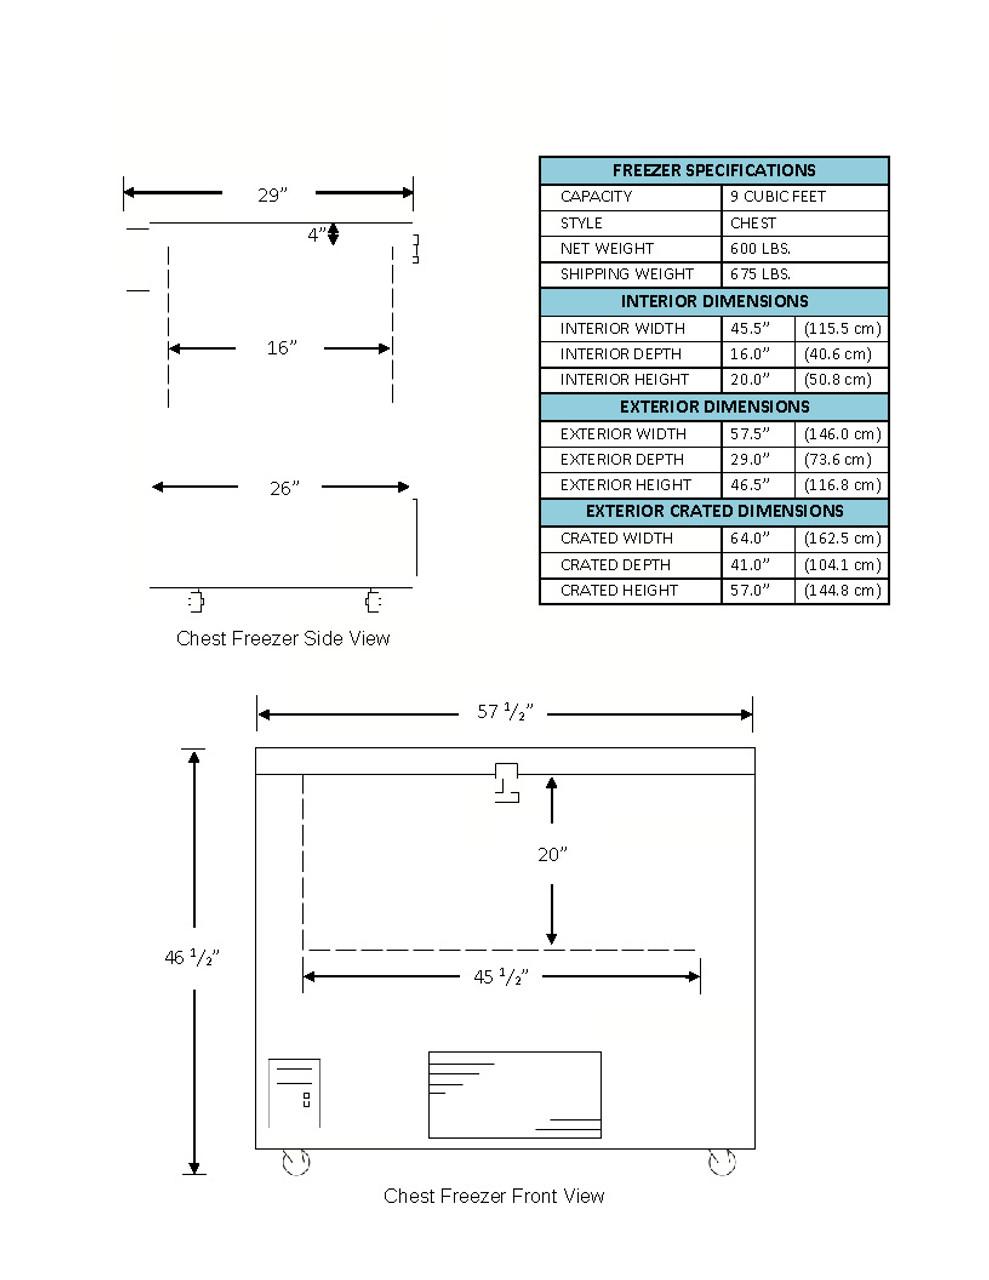 So-Low C85-9 Ultra-Low -85°C Chest Freezer - 9 Cubic Ft